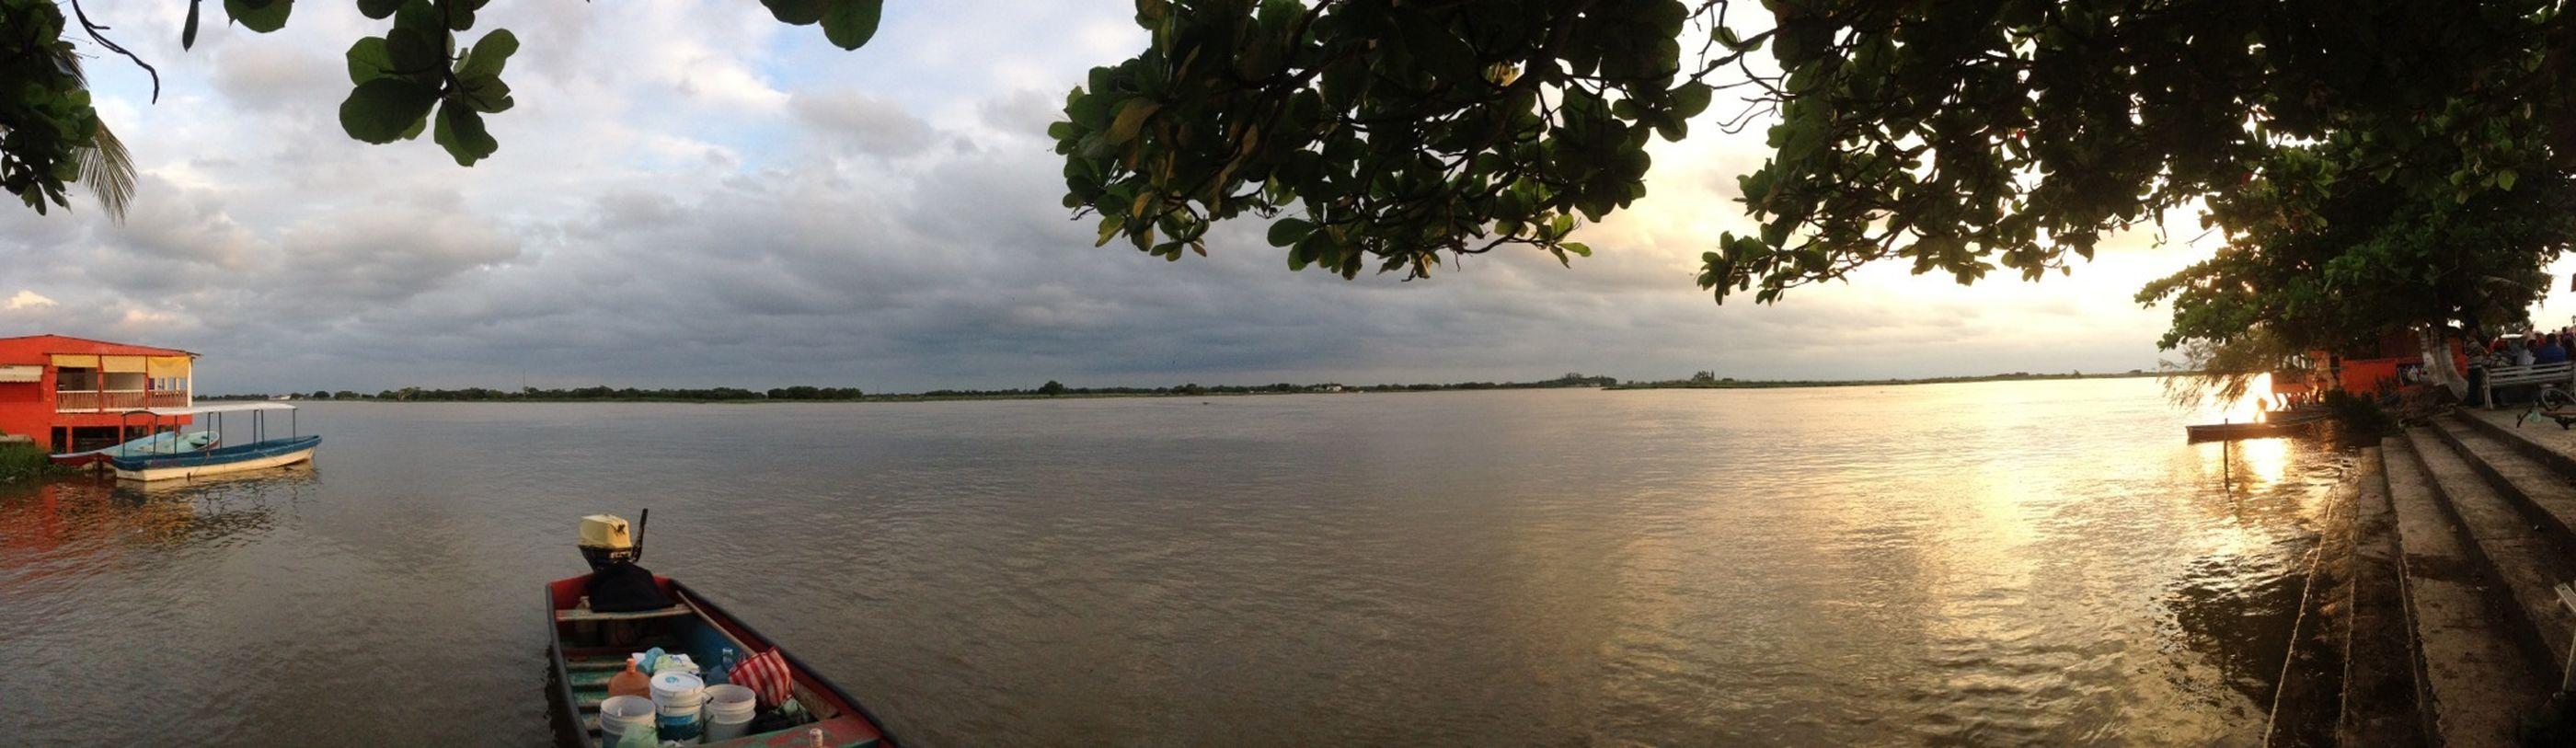 River Traveling Relaxing Veracruz